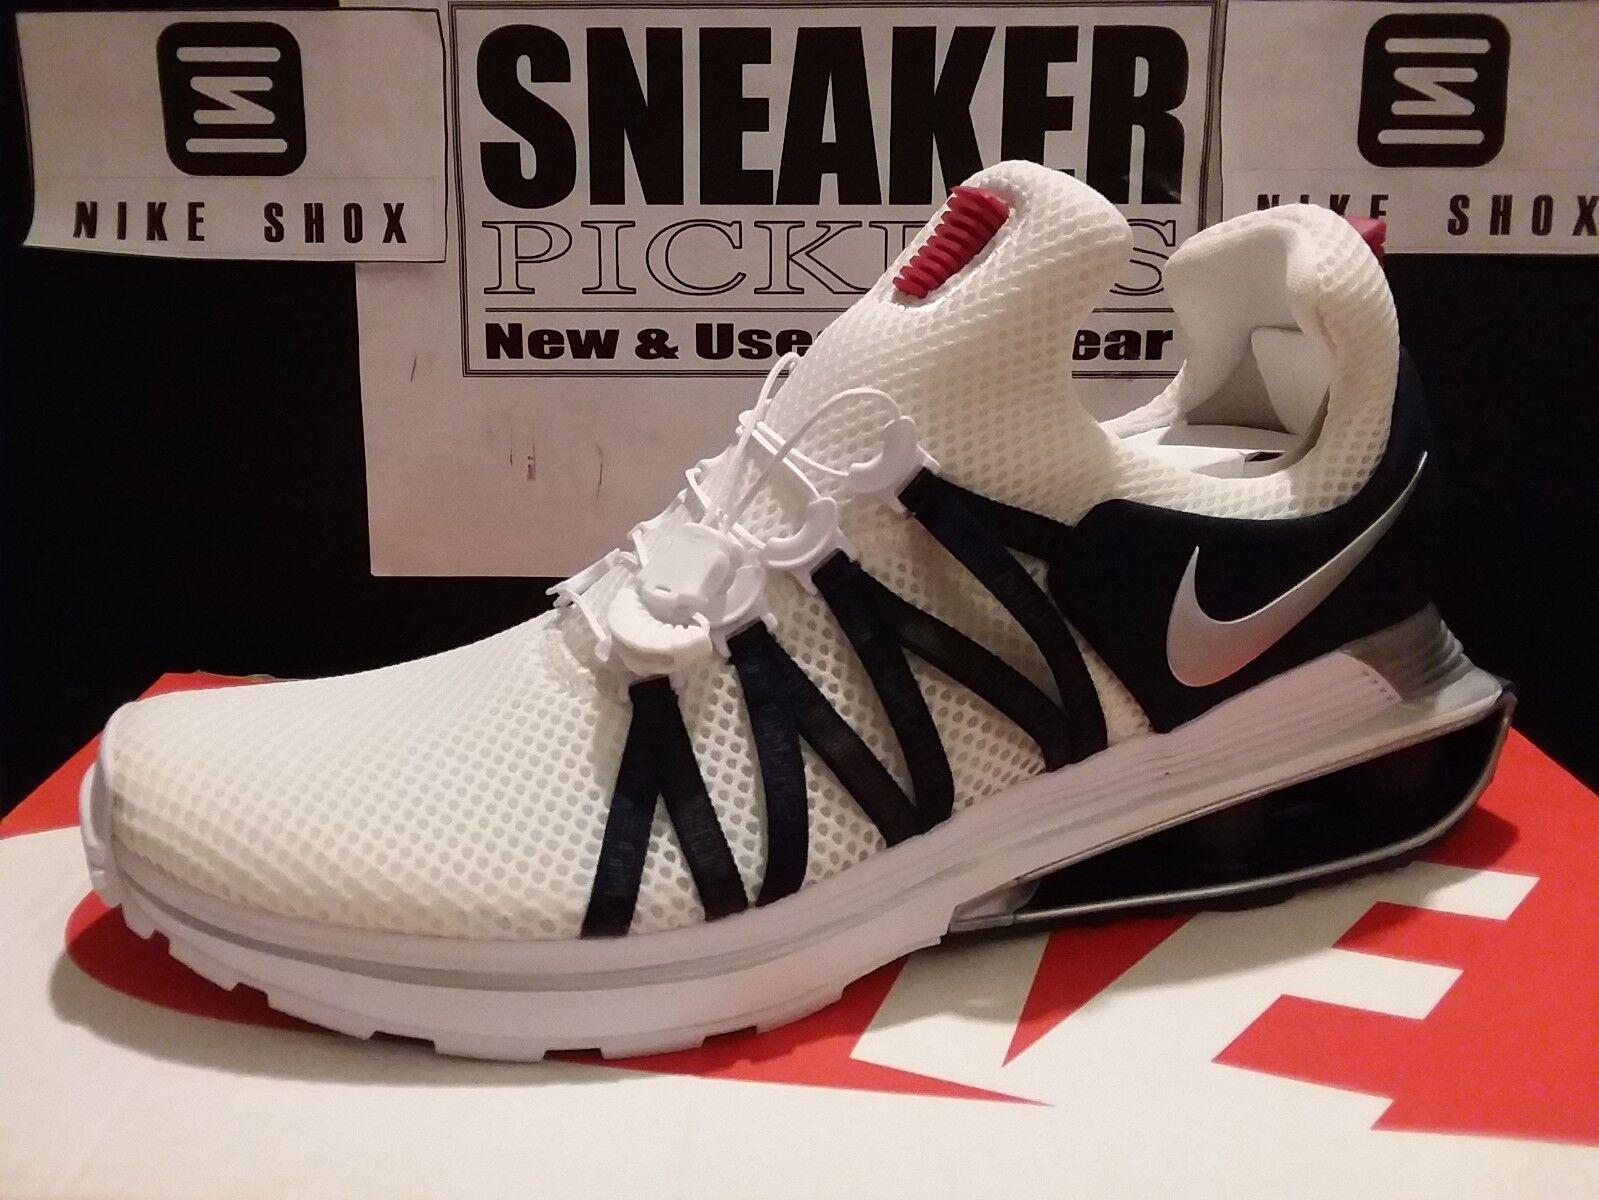 9f2efb15c8 Nike Air Jordan 679680-020 Flight Remix Black Infrared 23 Grey Sneakers Size  12